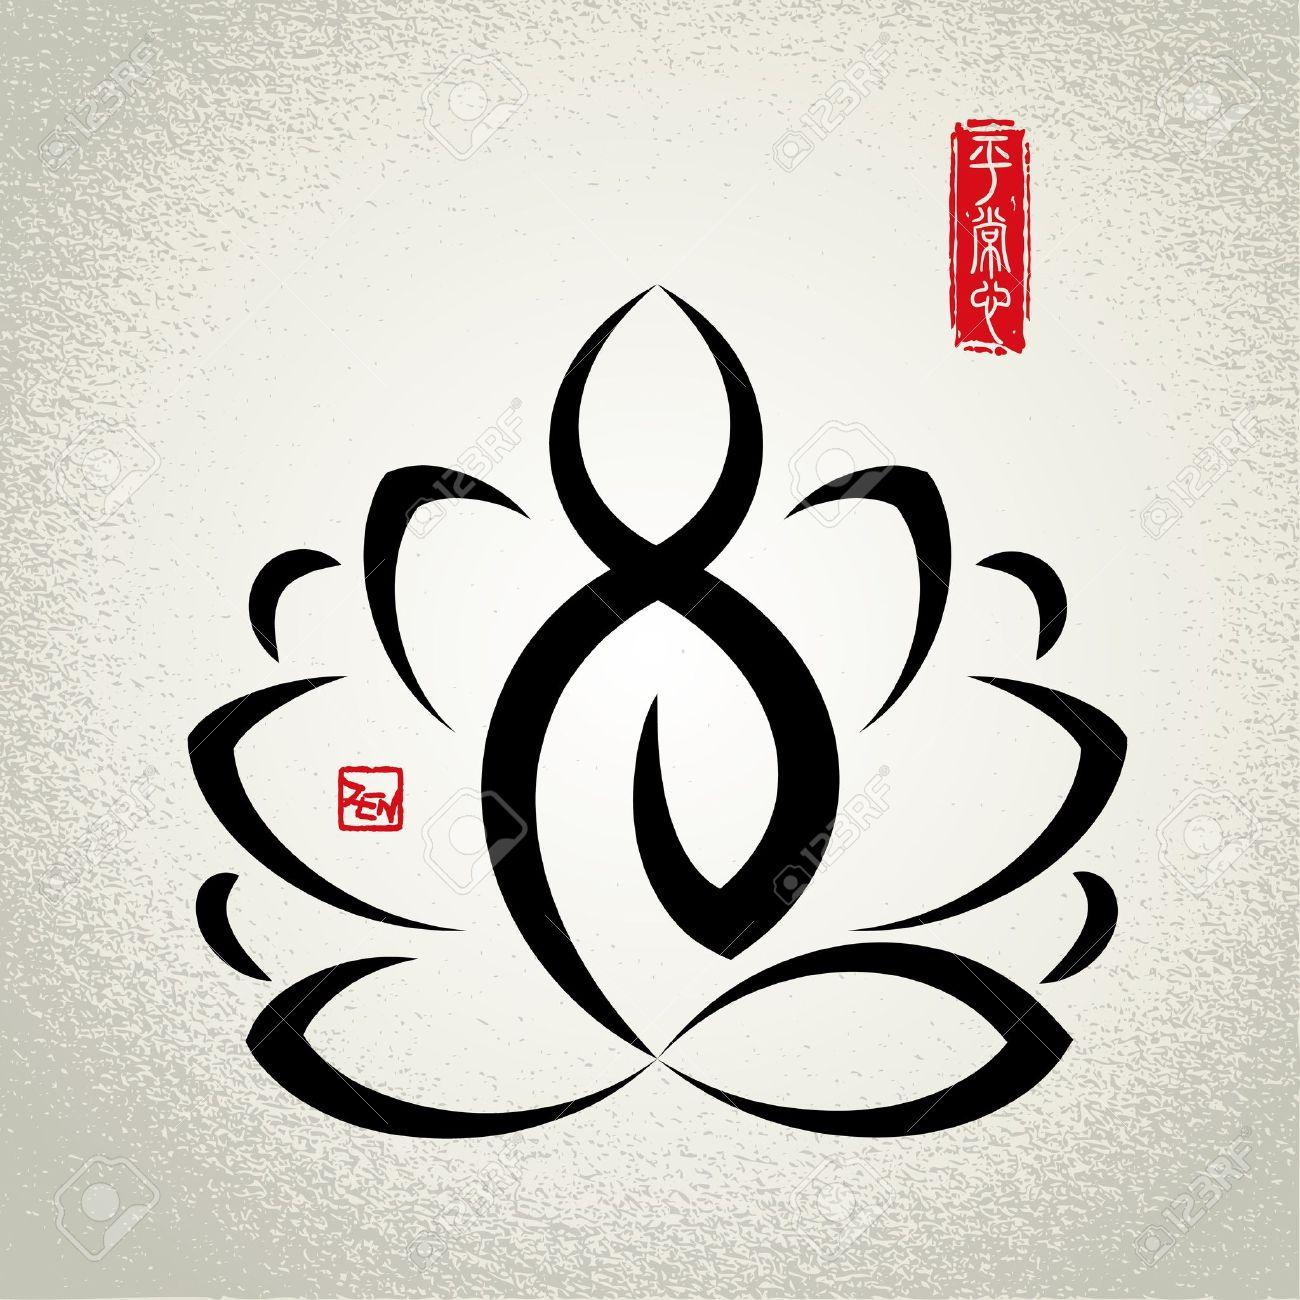 Lotus Et La Meditation Zen Clip Art Libres De Droits Vecteurs